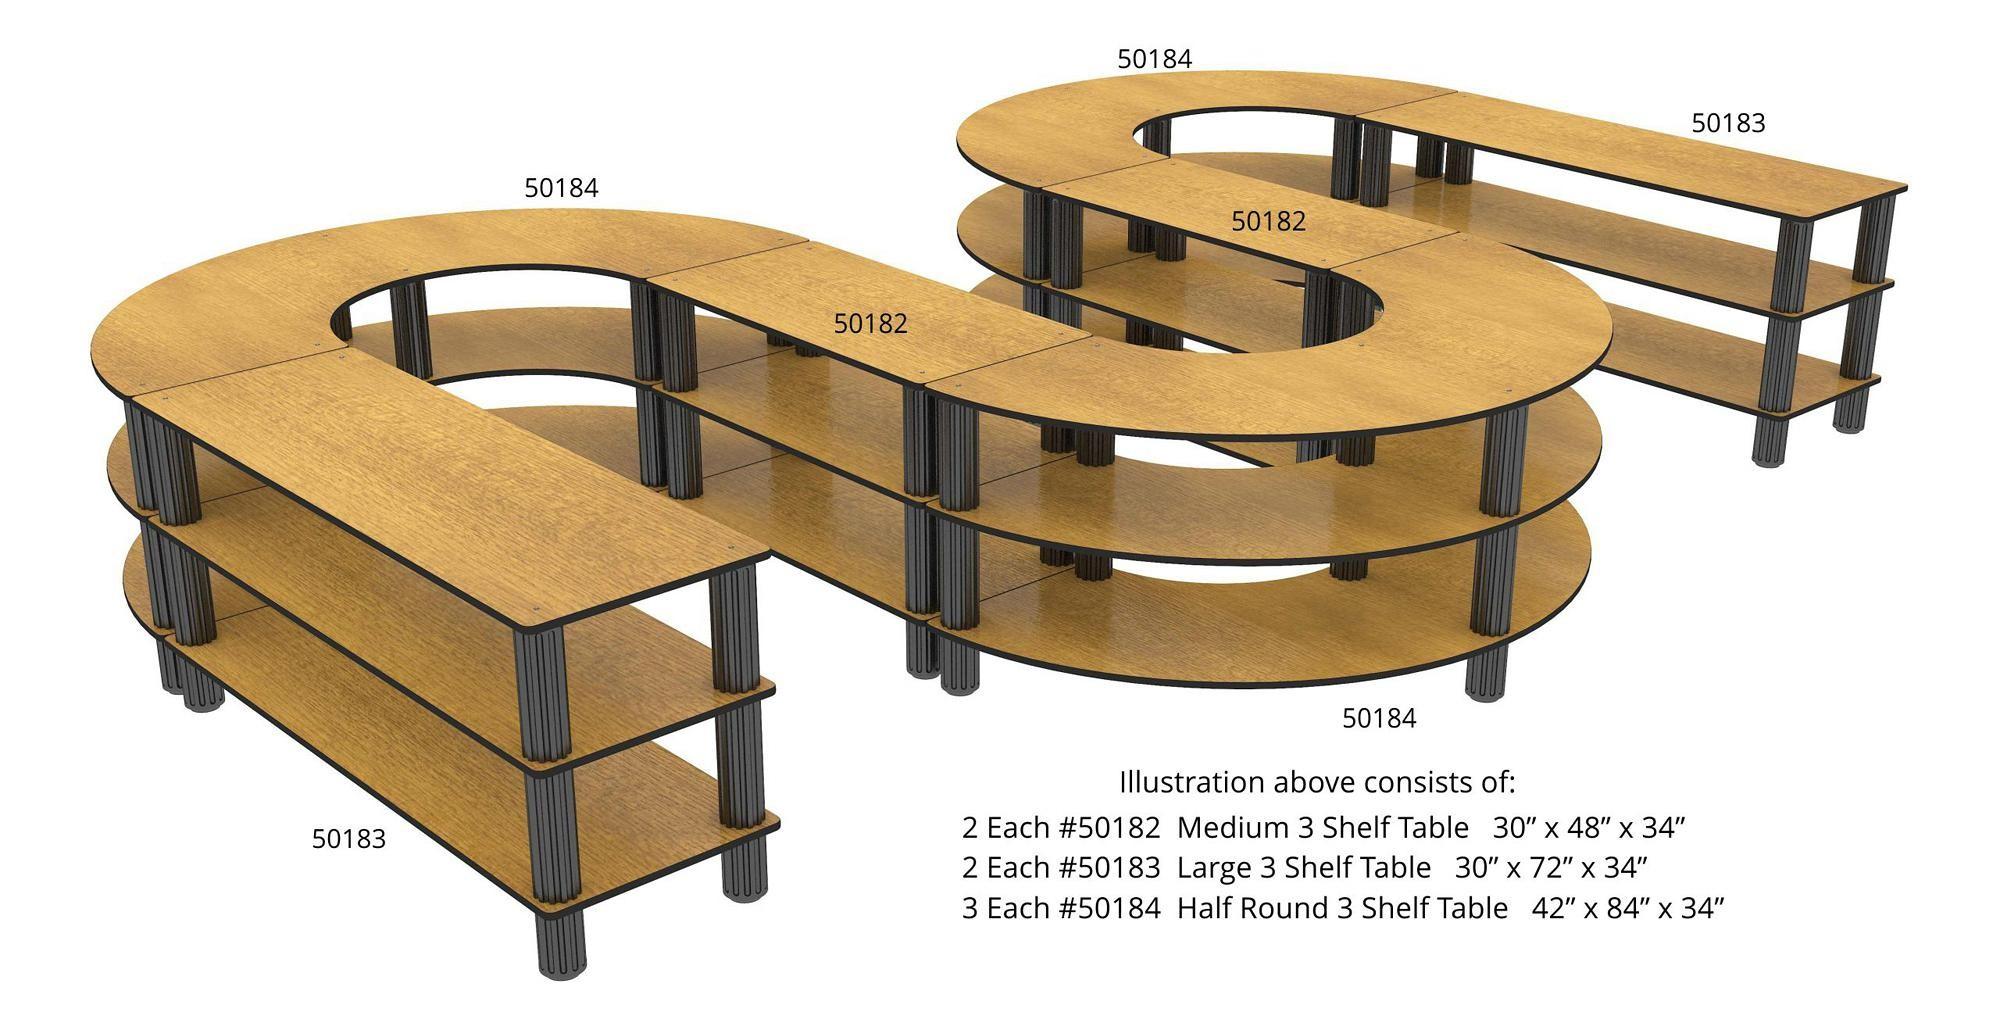 bon chef 50183lvcherry large 3 shelf flex table with cherry finish 30 x 72 x 34 lionsdeal. Black Bedroom Furniture Sets. Home Design Ideas